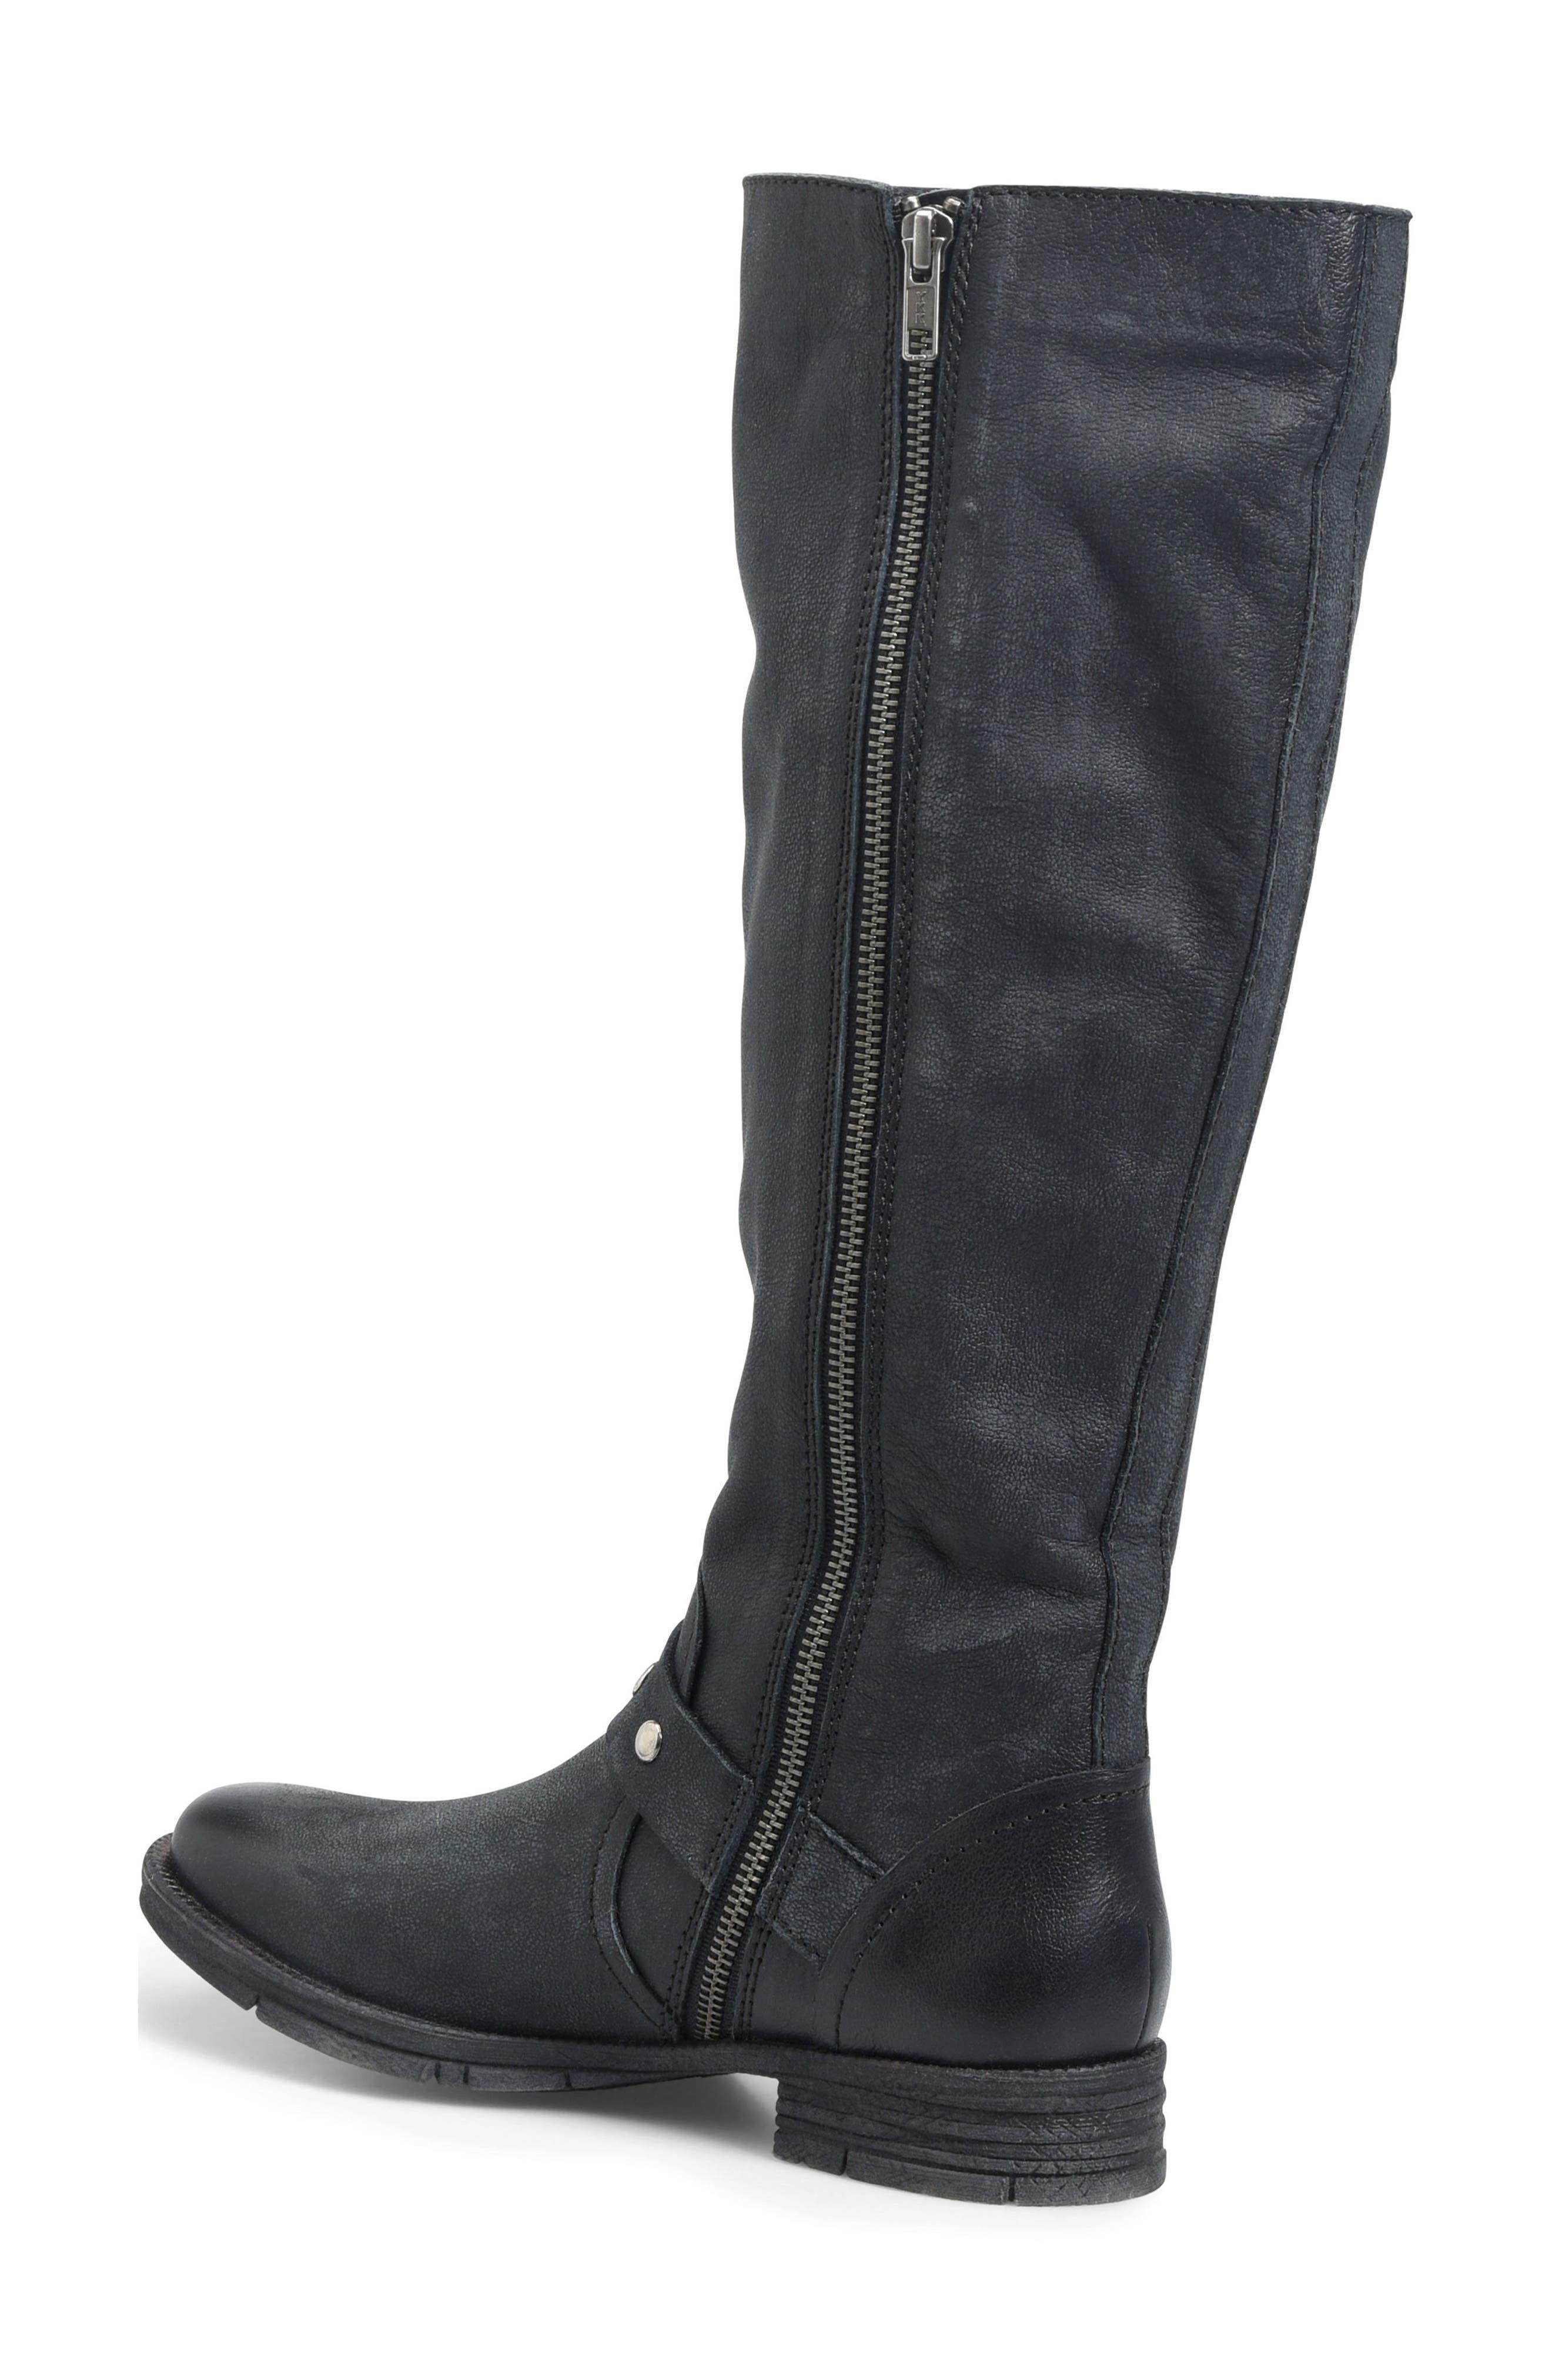 Ashland Knee High Boot,                             Alternate thumbnail 2, color,                             001